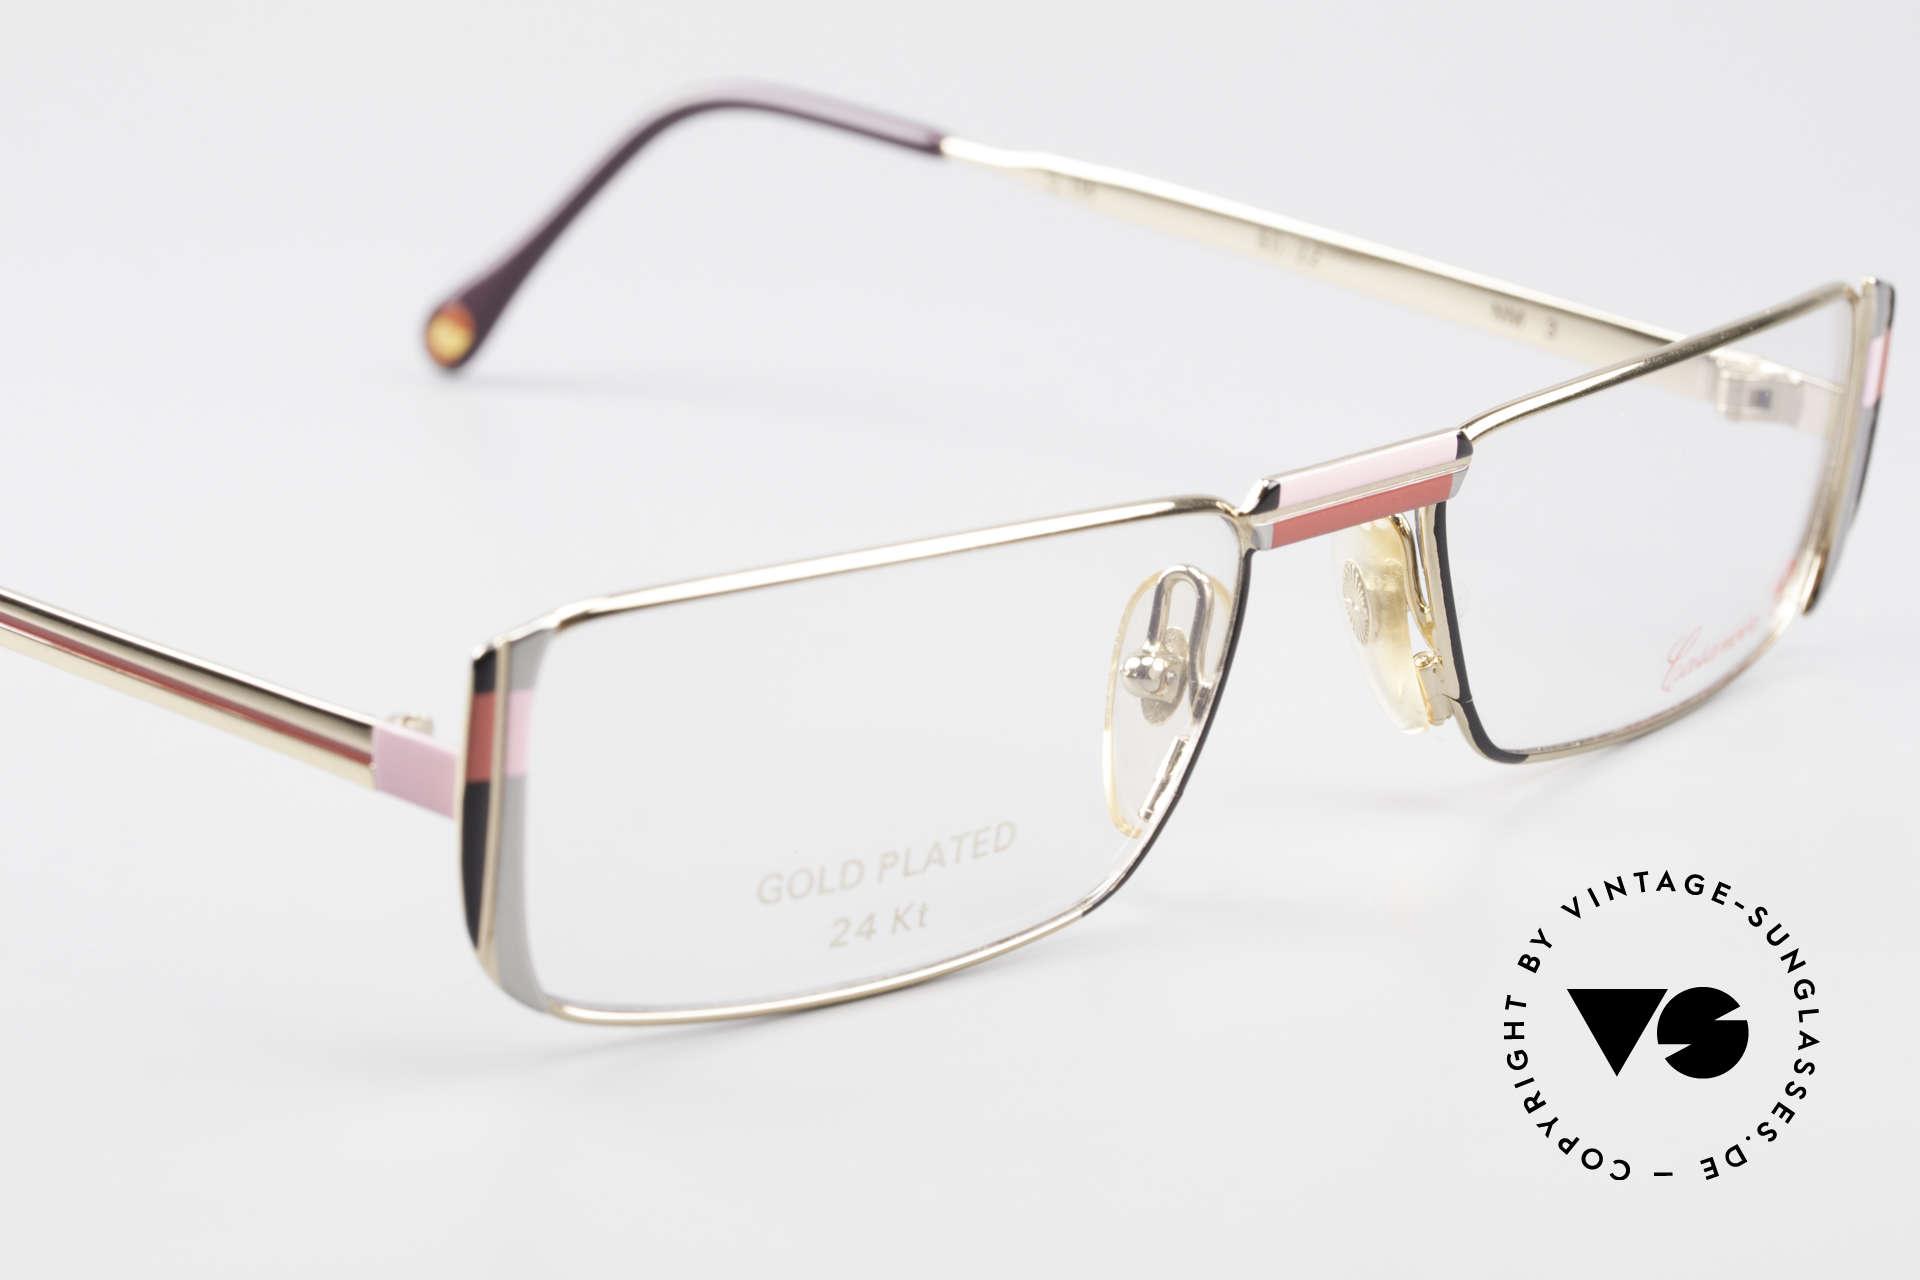 Casanova NM3 Gold Plated Reading Glasses, NOS - unworn (like all our vintage Casanova frames), Made for Women